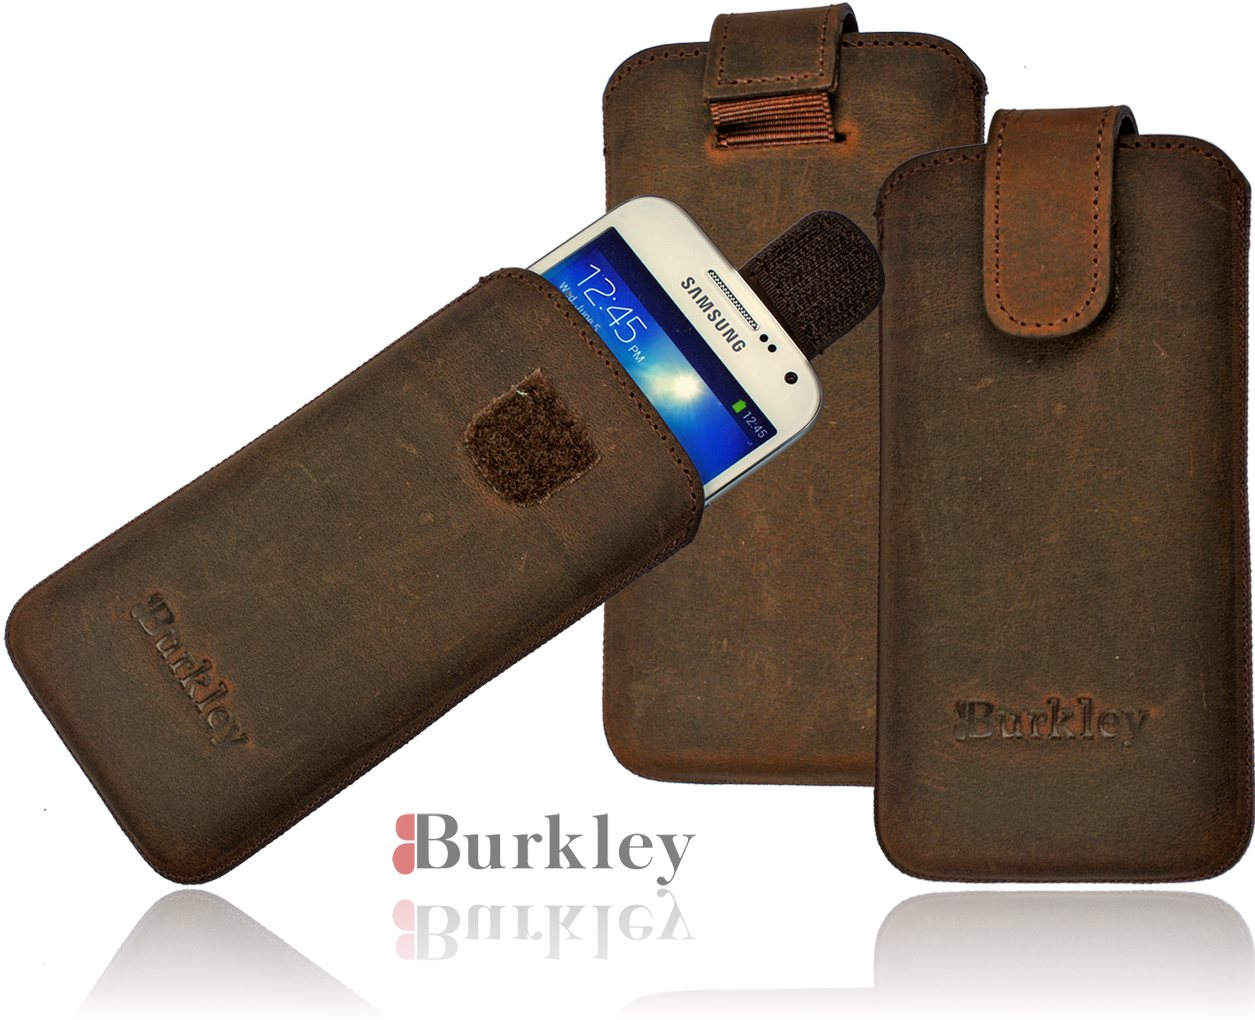 burkley premium lederh lle samsung galaxy s4 mini i9190. Black Bedroom Furniture Sets. Home Design Ideas